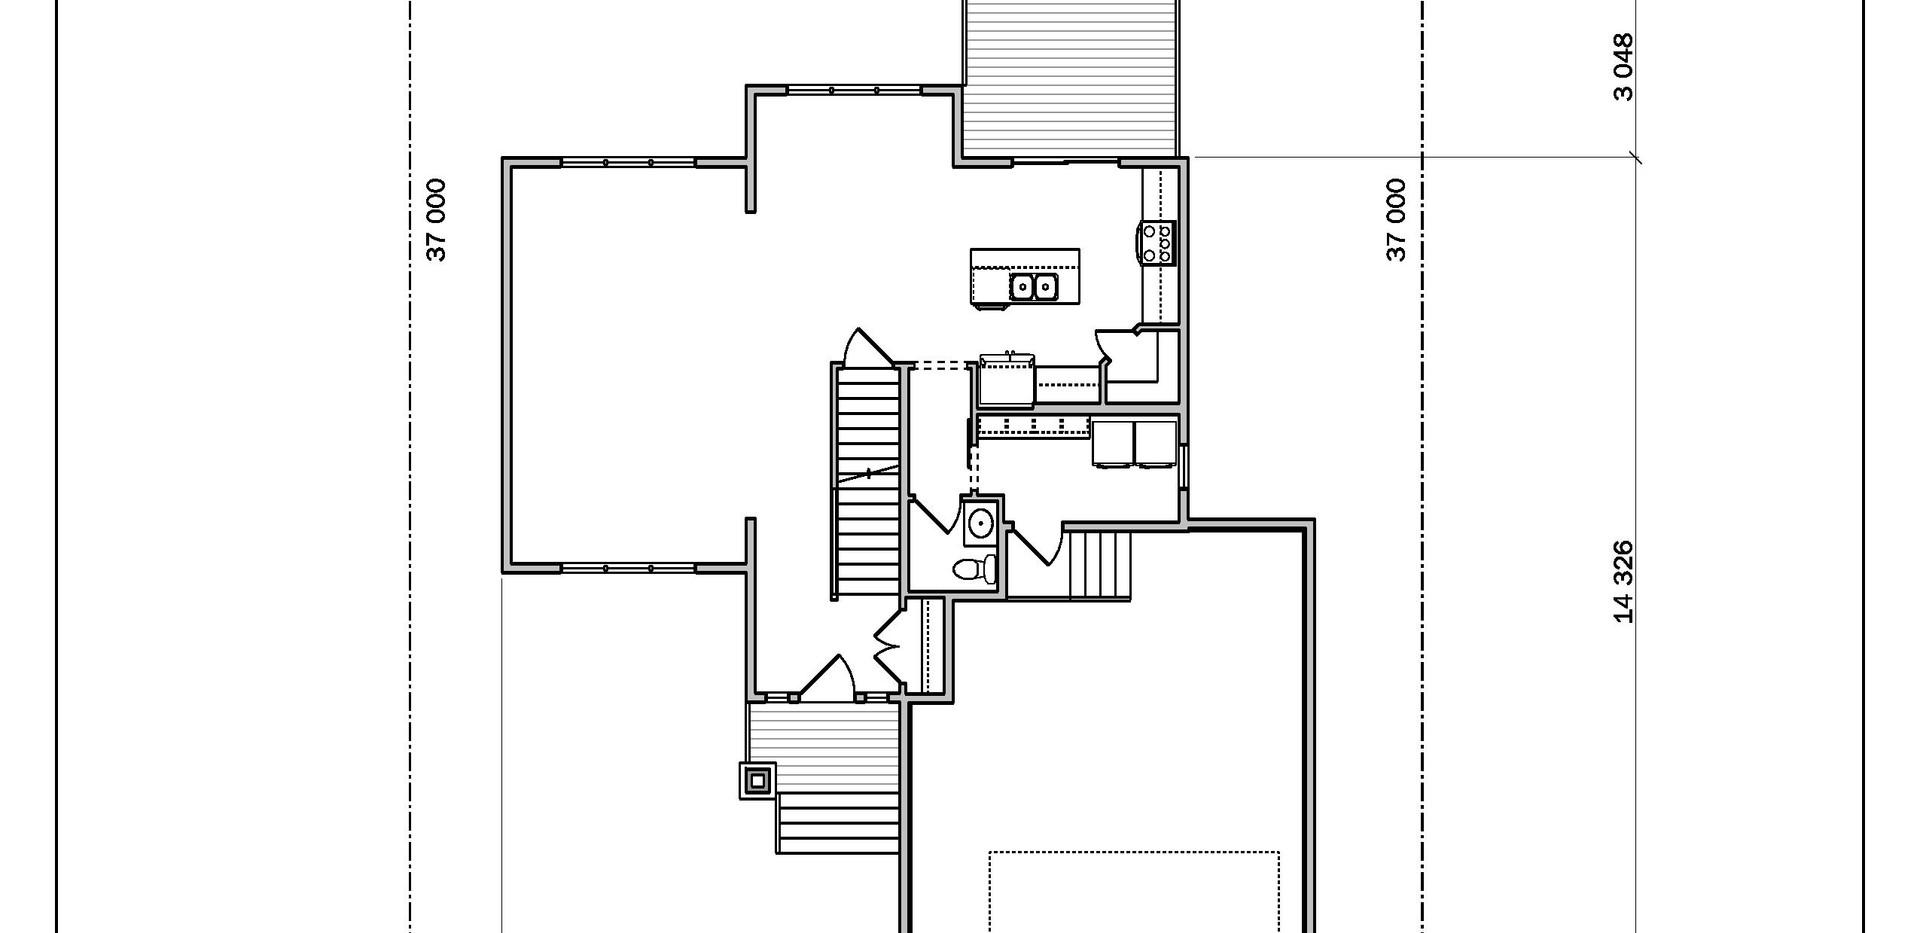 19 Vireo Avenue - Site Plan - 1-29-21-pa